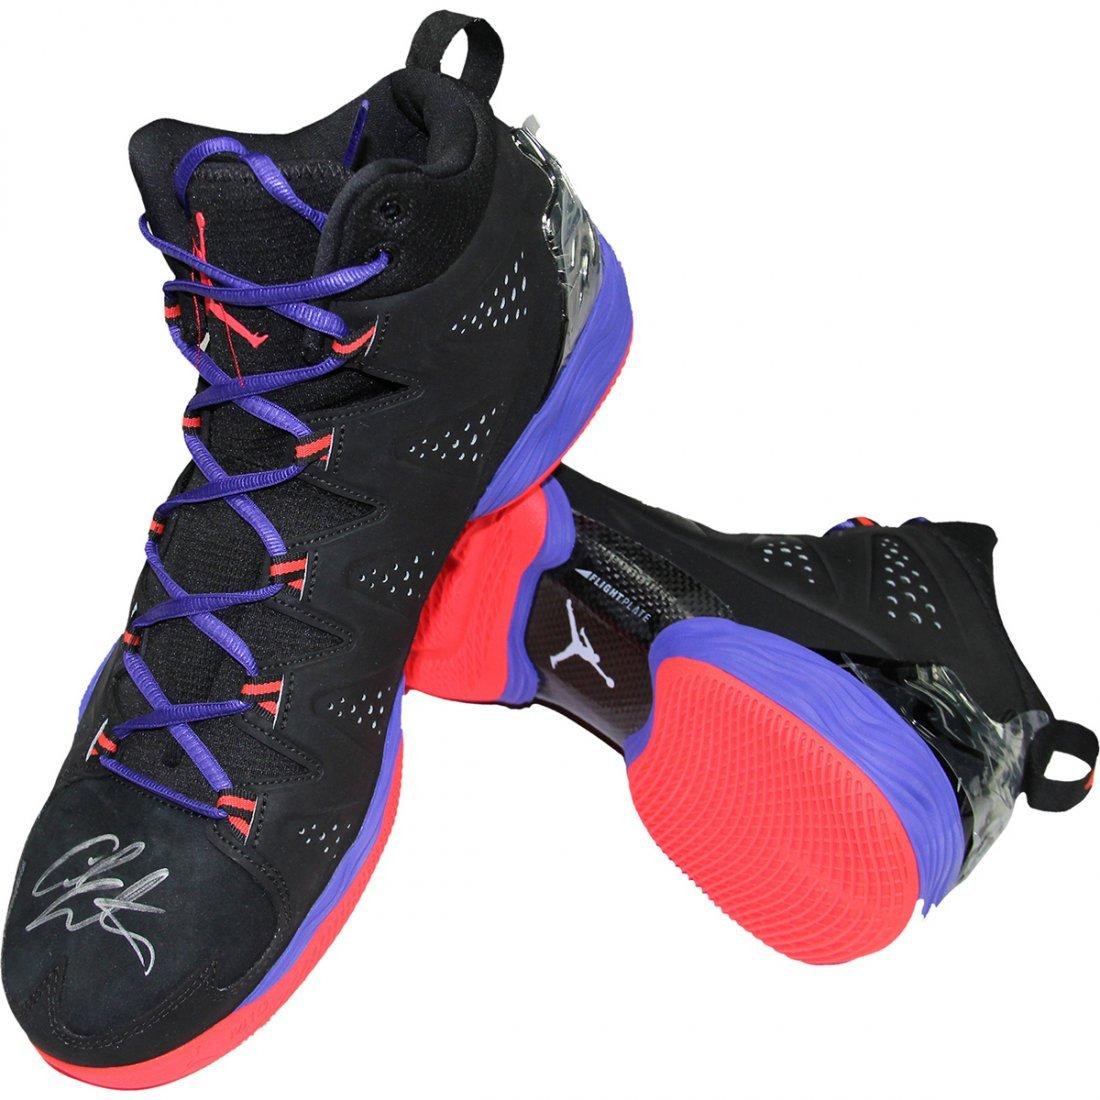 Carmelo Anthony Signed Right Shoe JORDAN MELO M10 Black